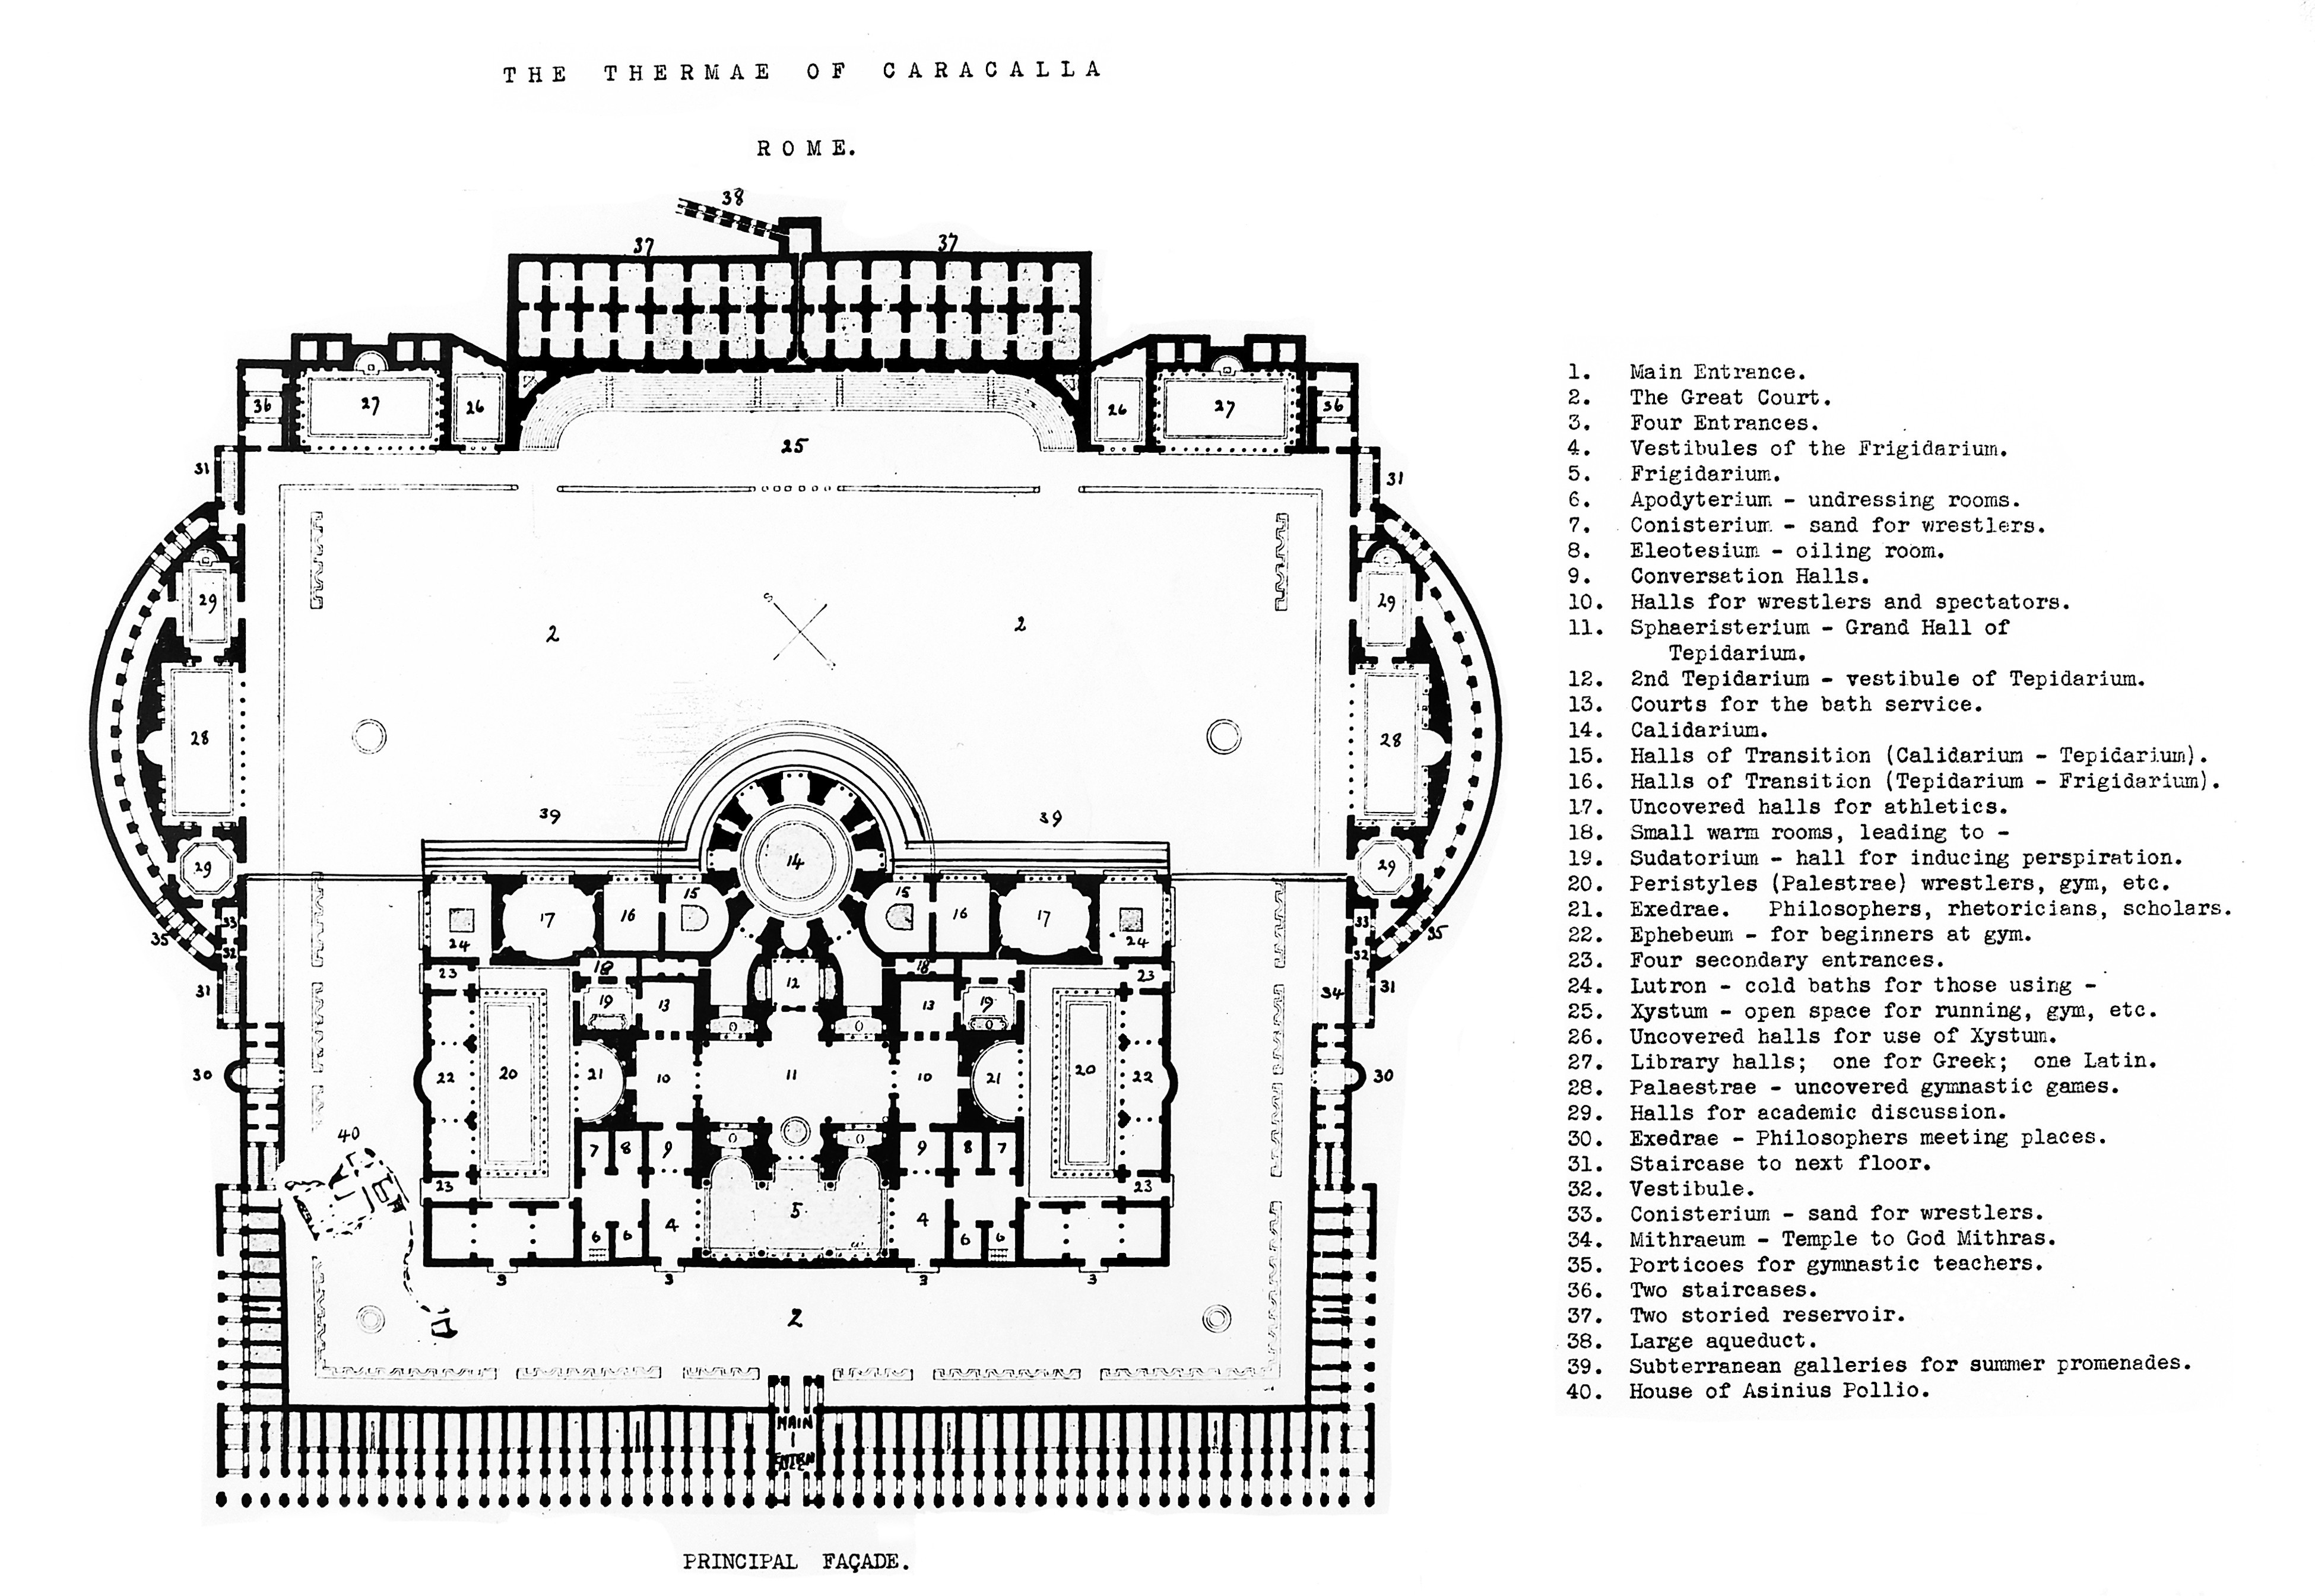 Hidden History The Baths Of Caracalla Wandering Jana